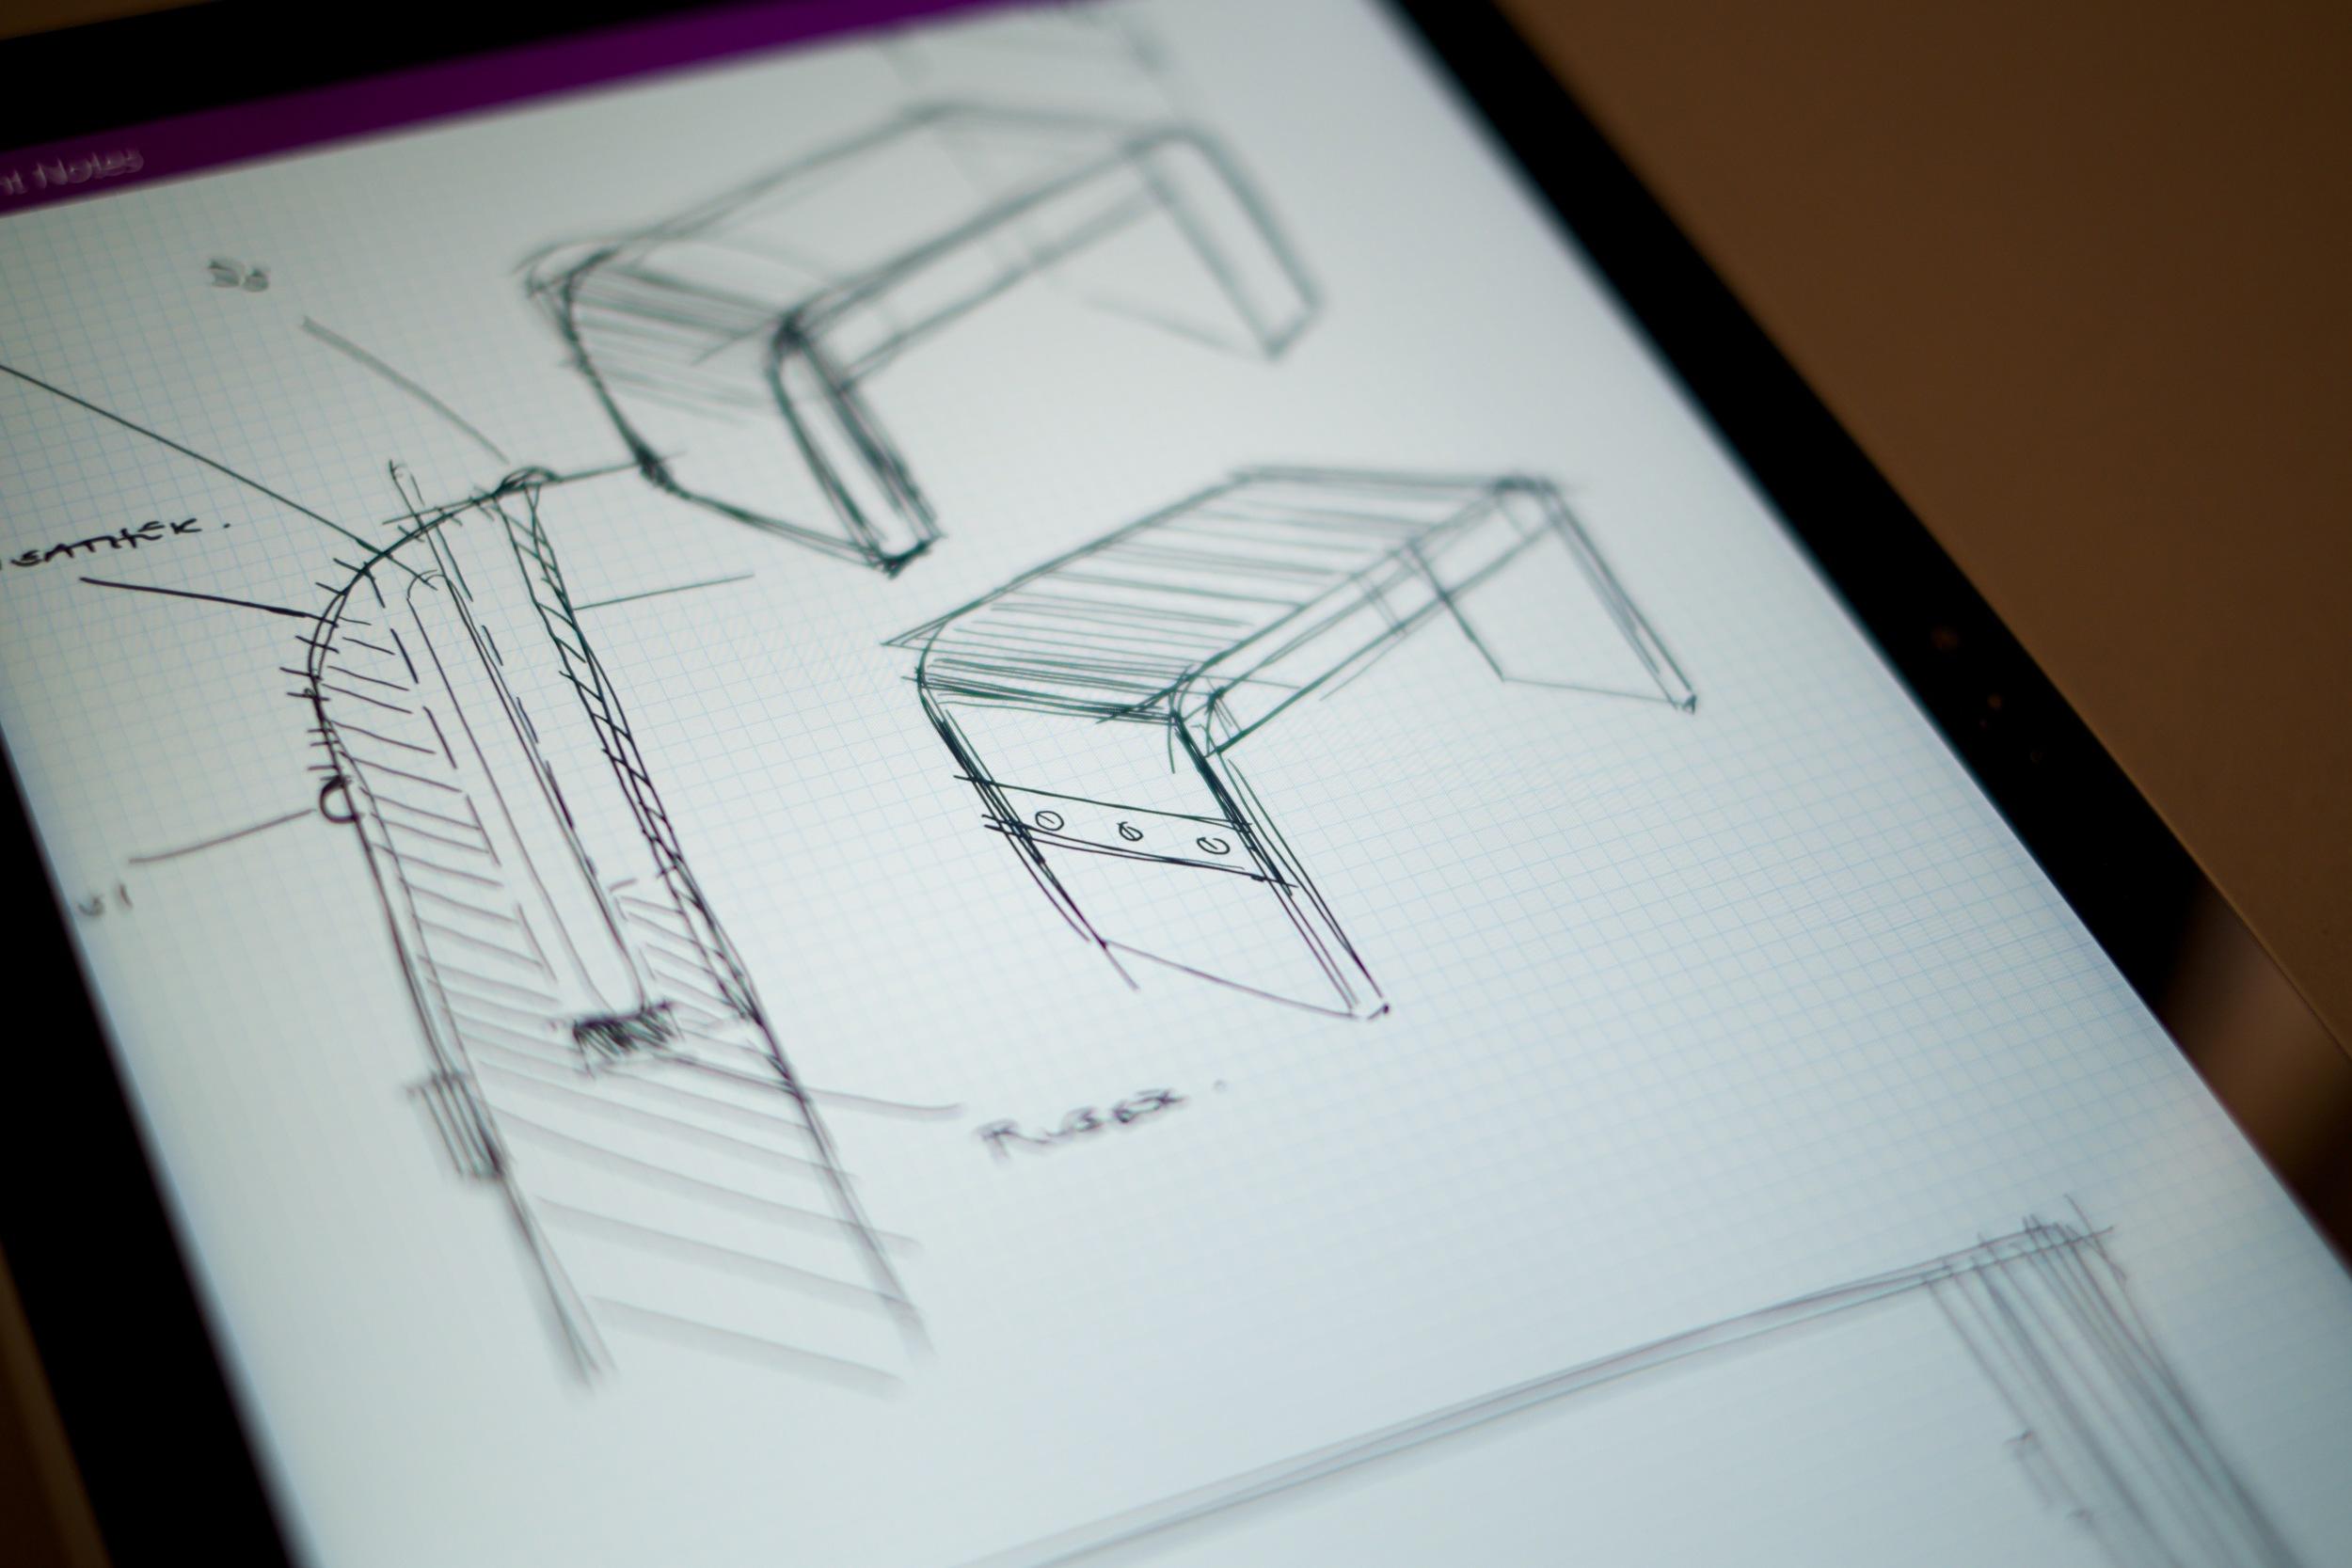 Initial digital design sketches.